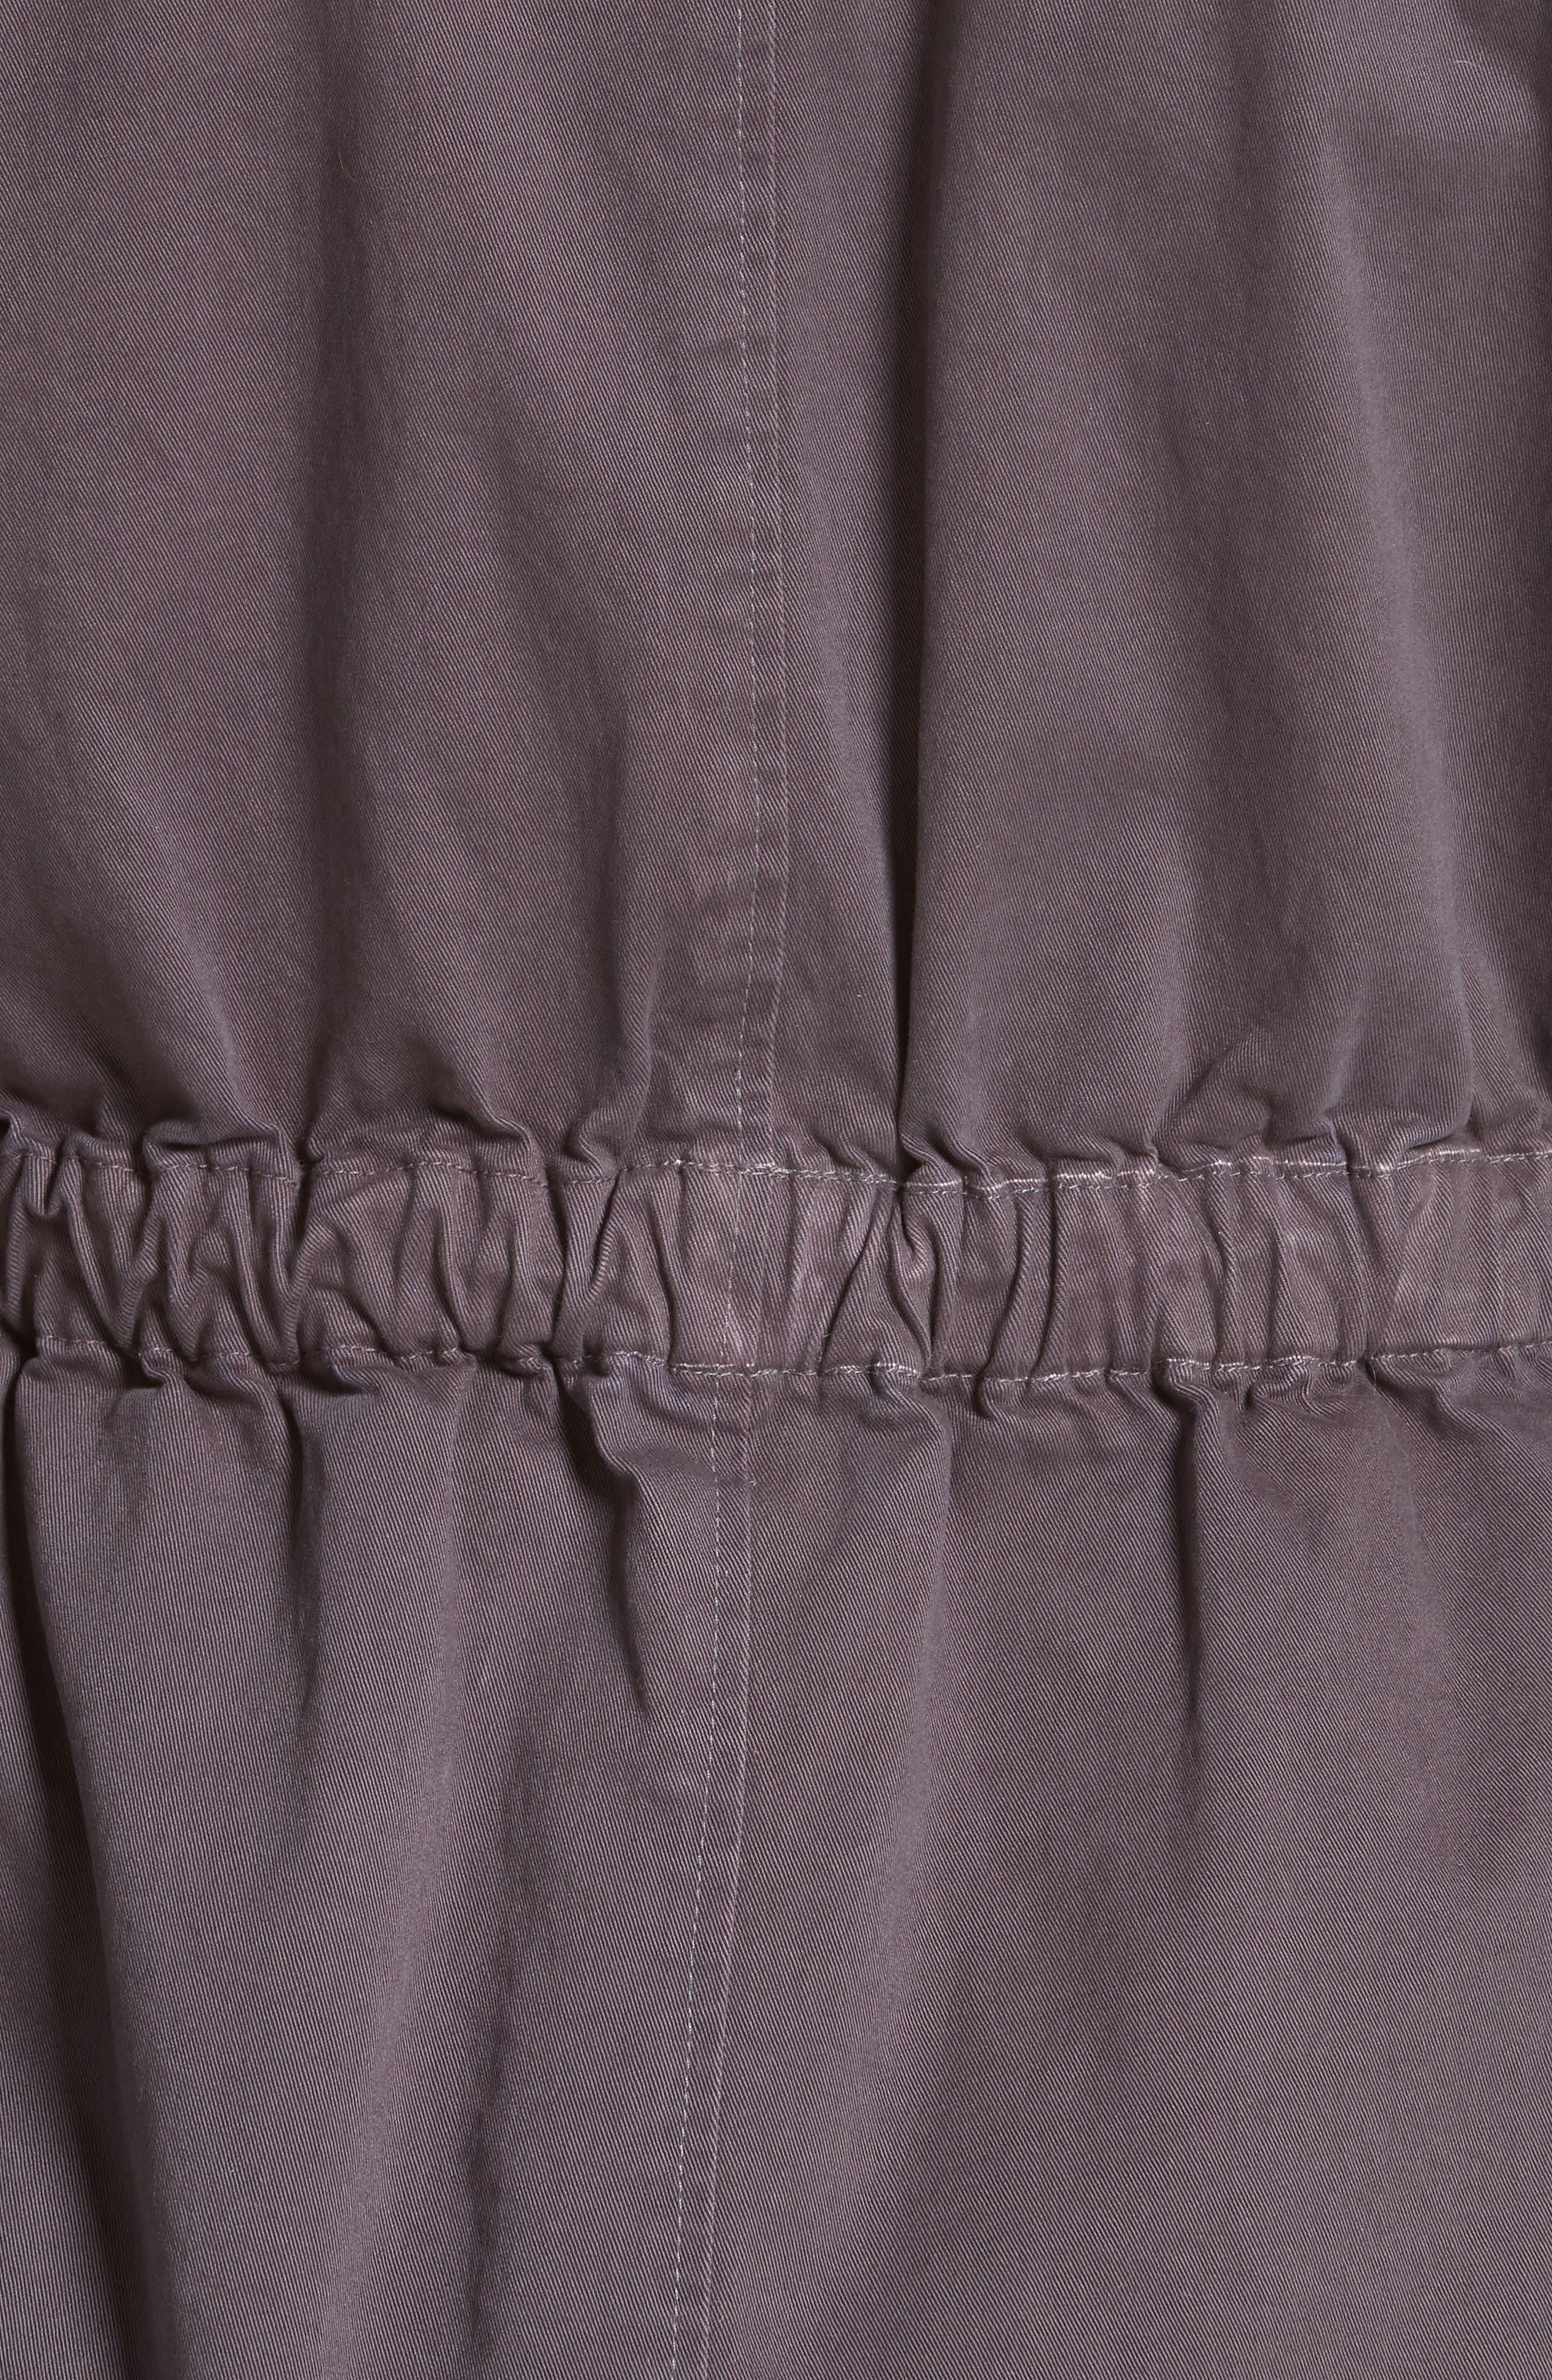 Twill Utility Jacket,                             Alternate thumbnail 6, color,                             099